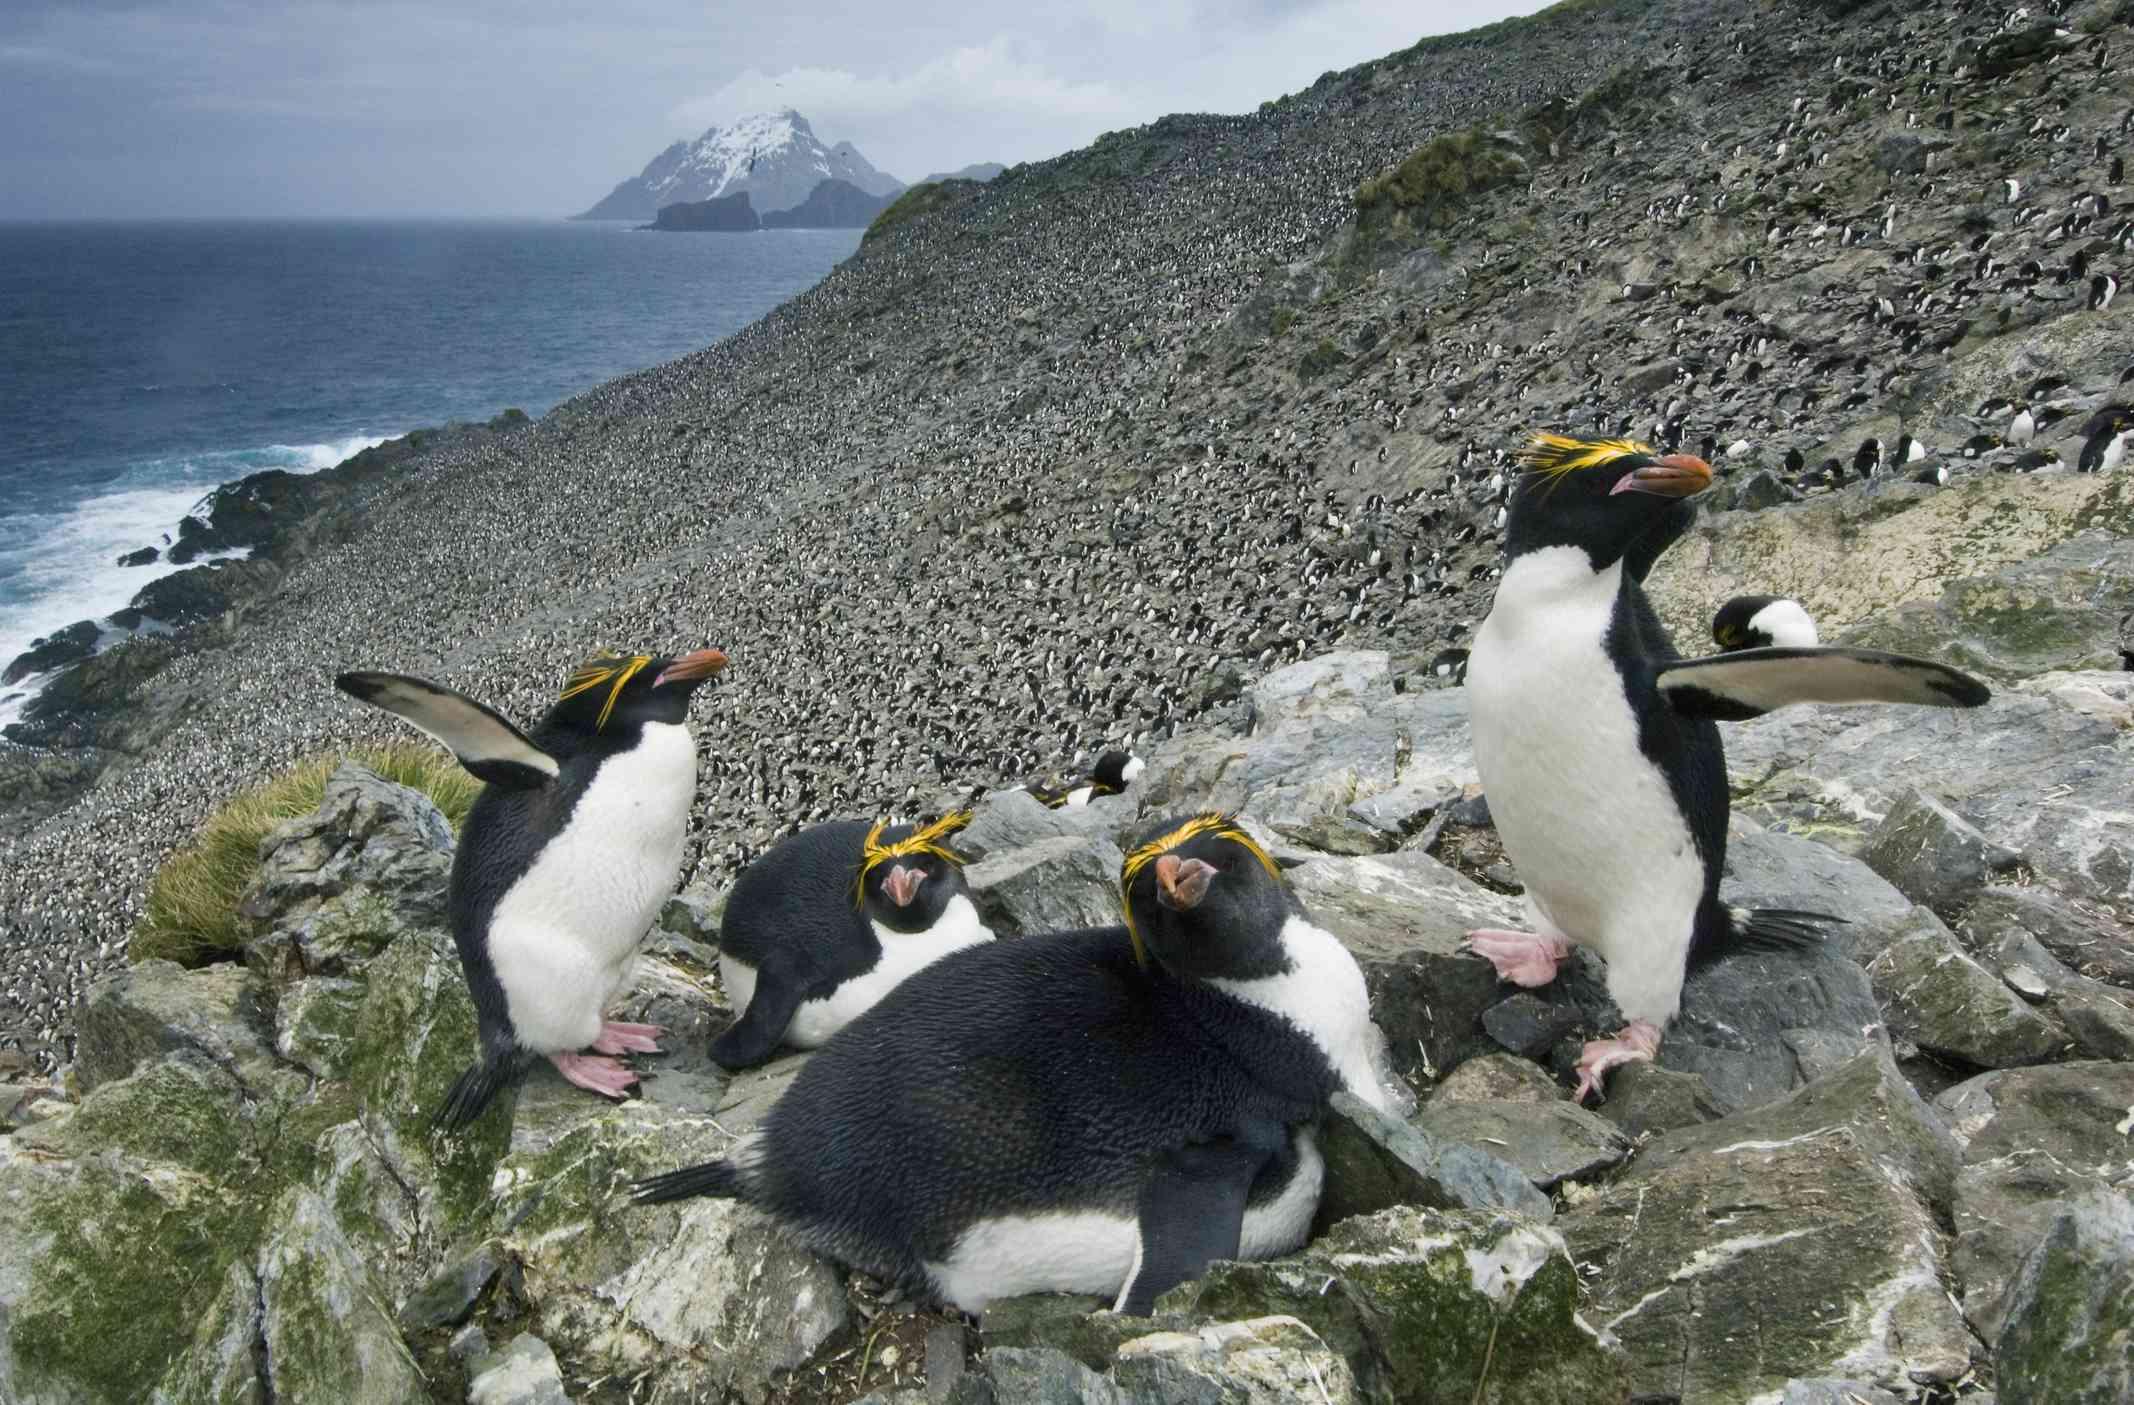 Four macaroni penguins on a rocky coastline